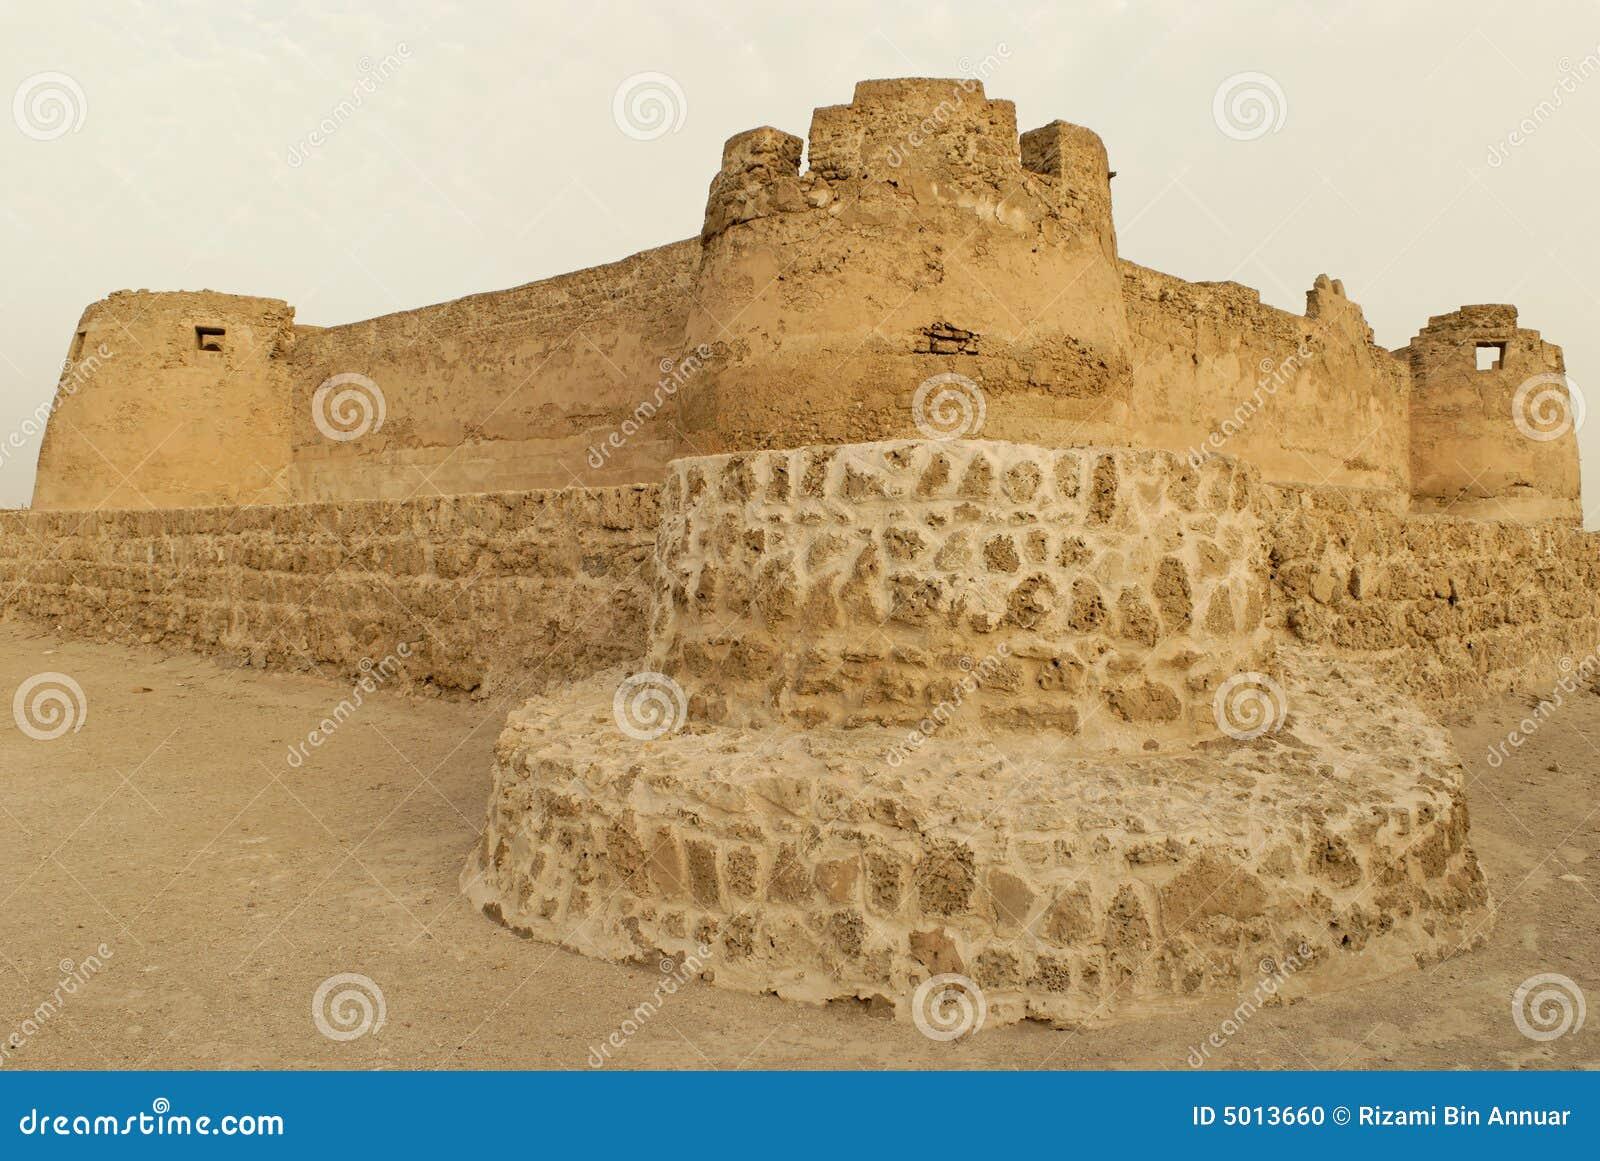 Fortificazione di Arad, Bahrain